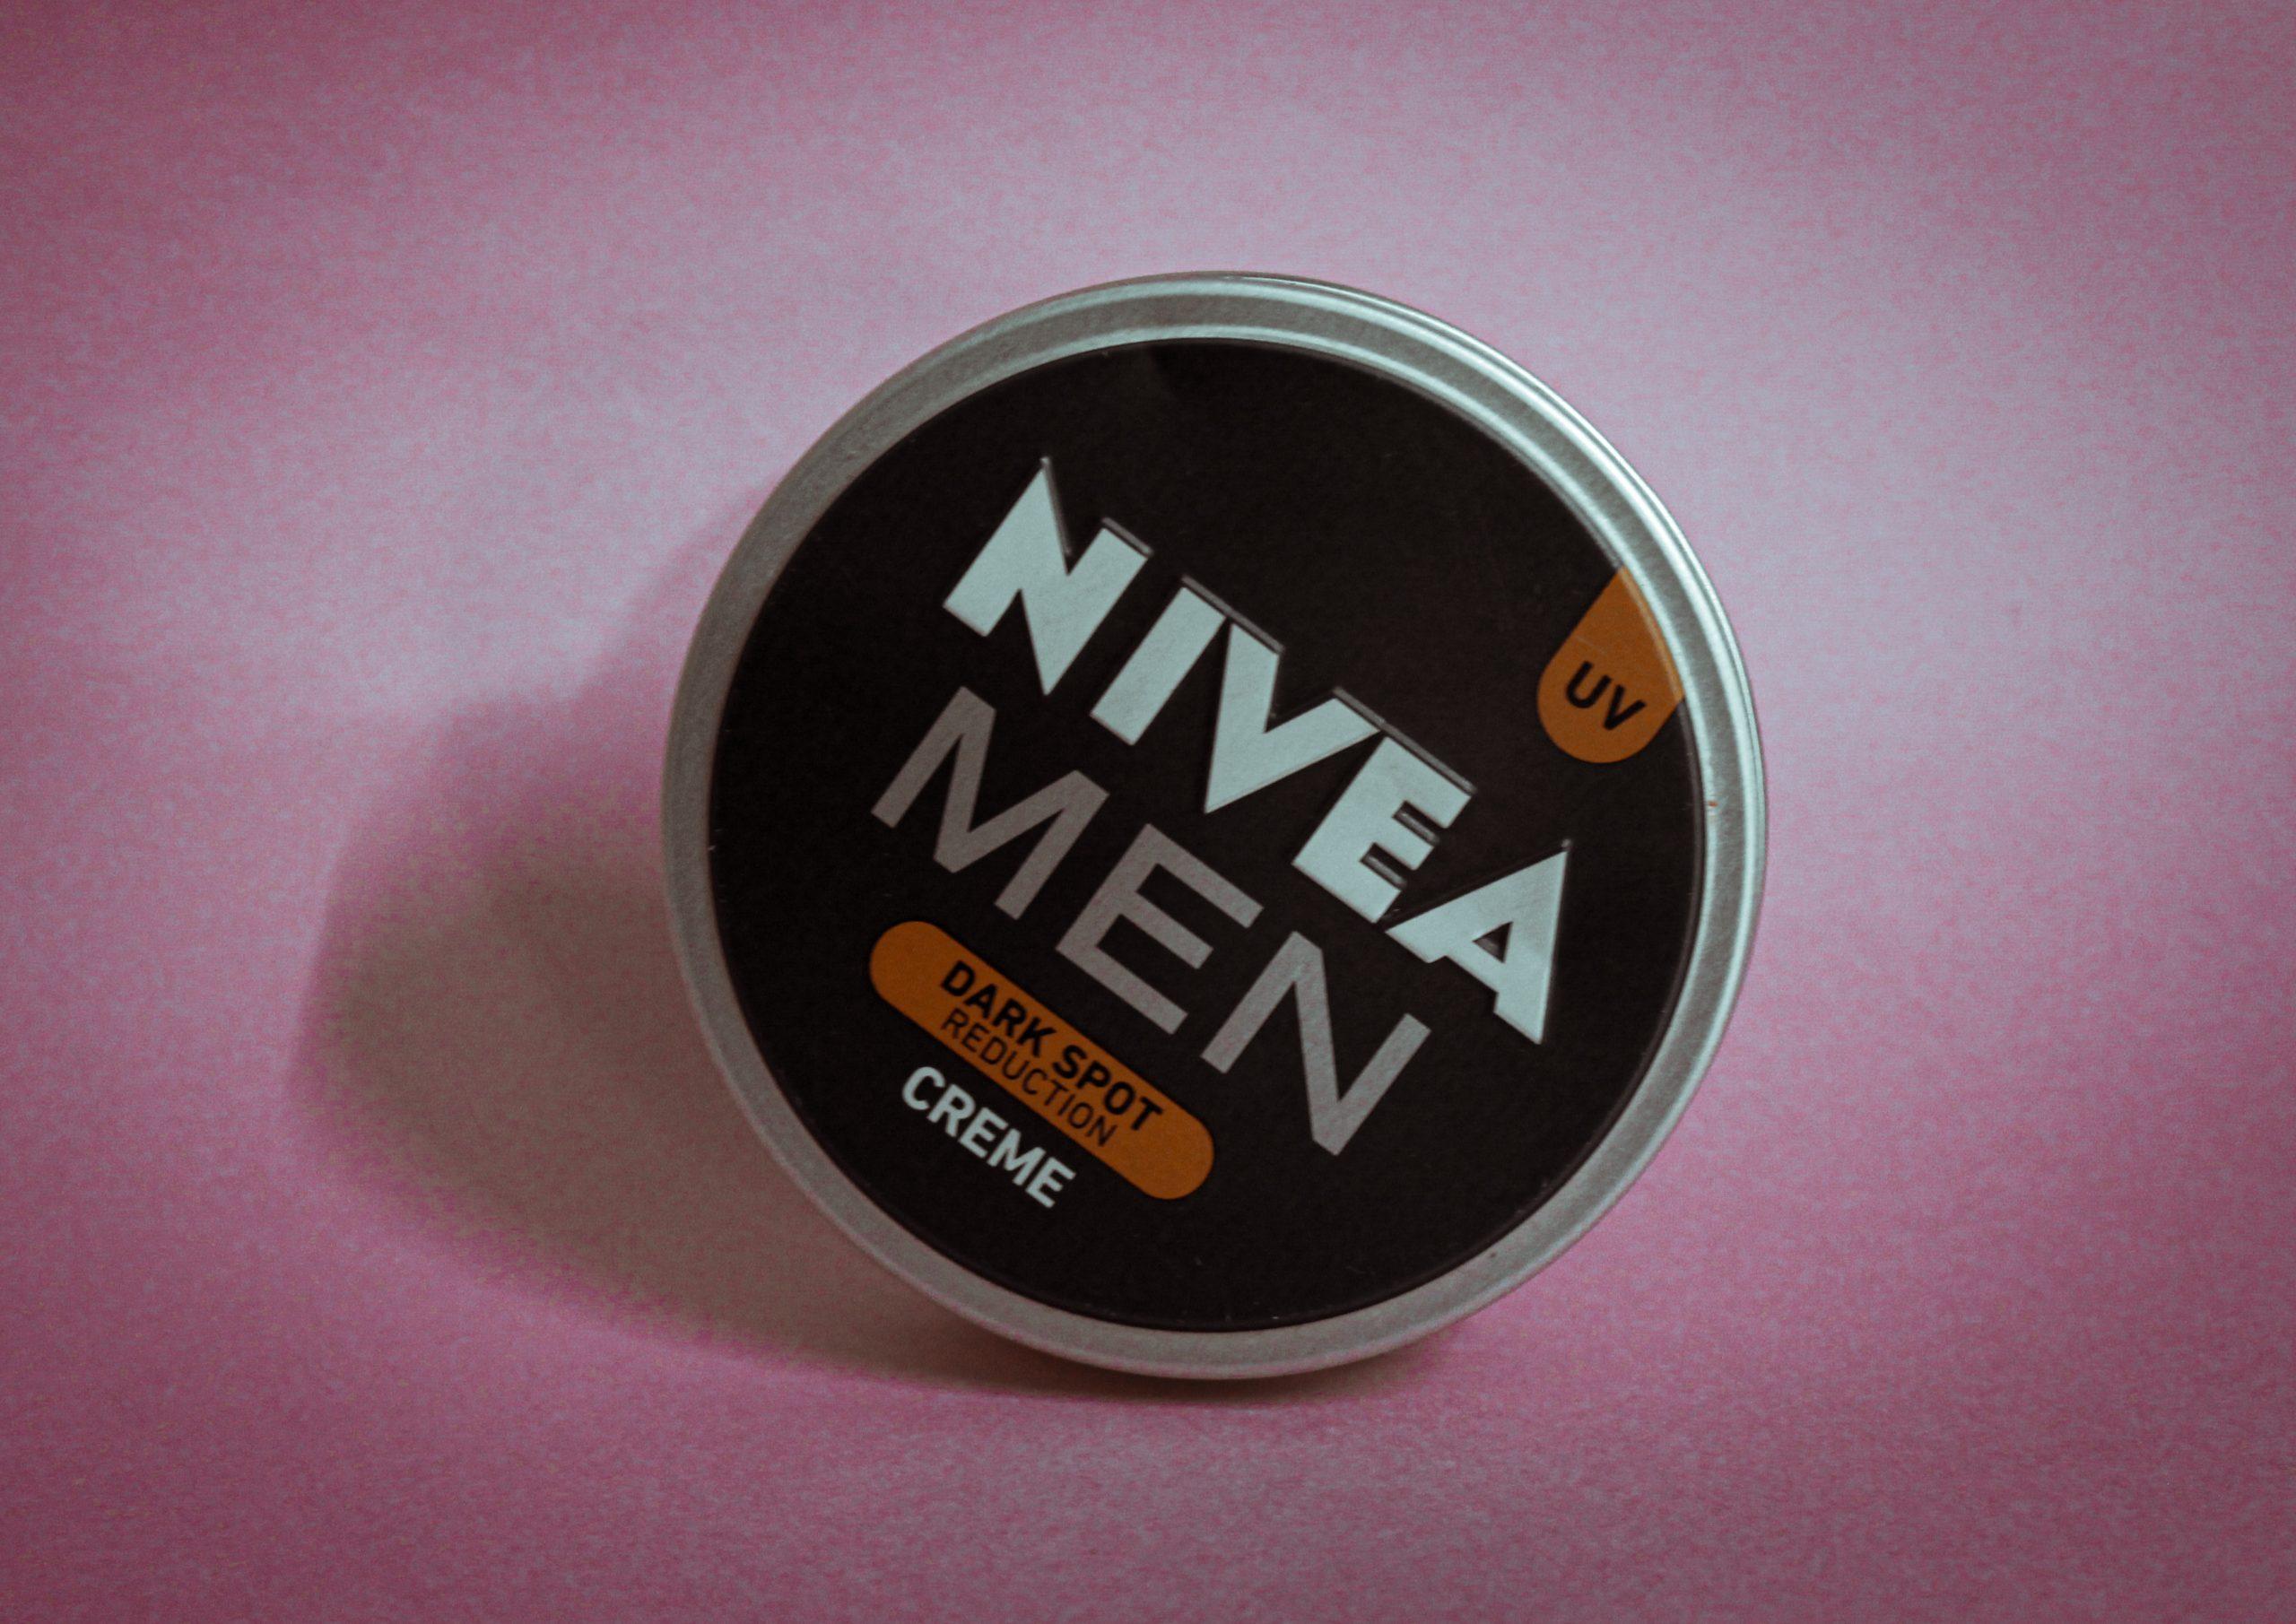 Nivea company face cream